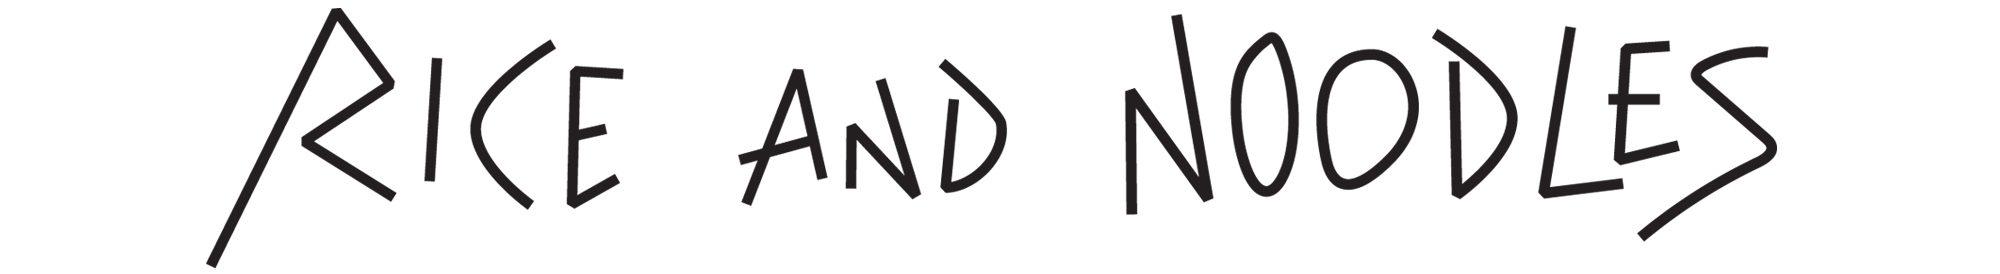 logo Rice and noodles pour le groupe Street BKK, design IchetKar